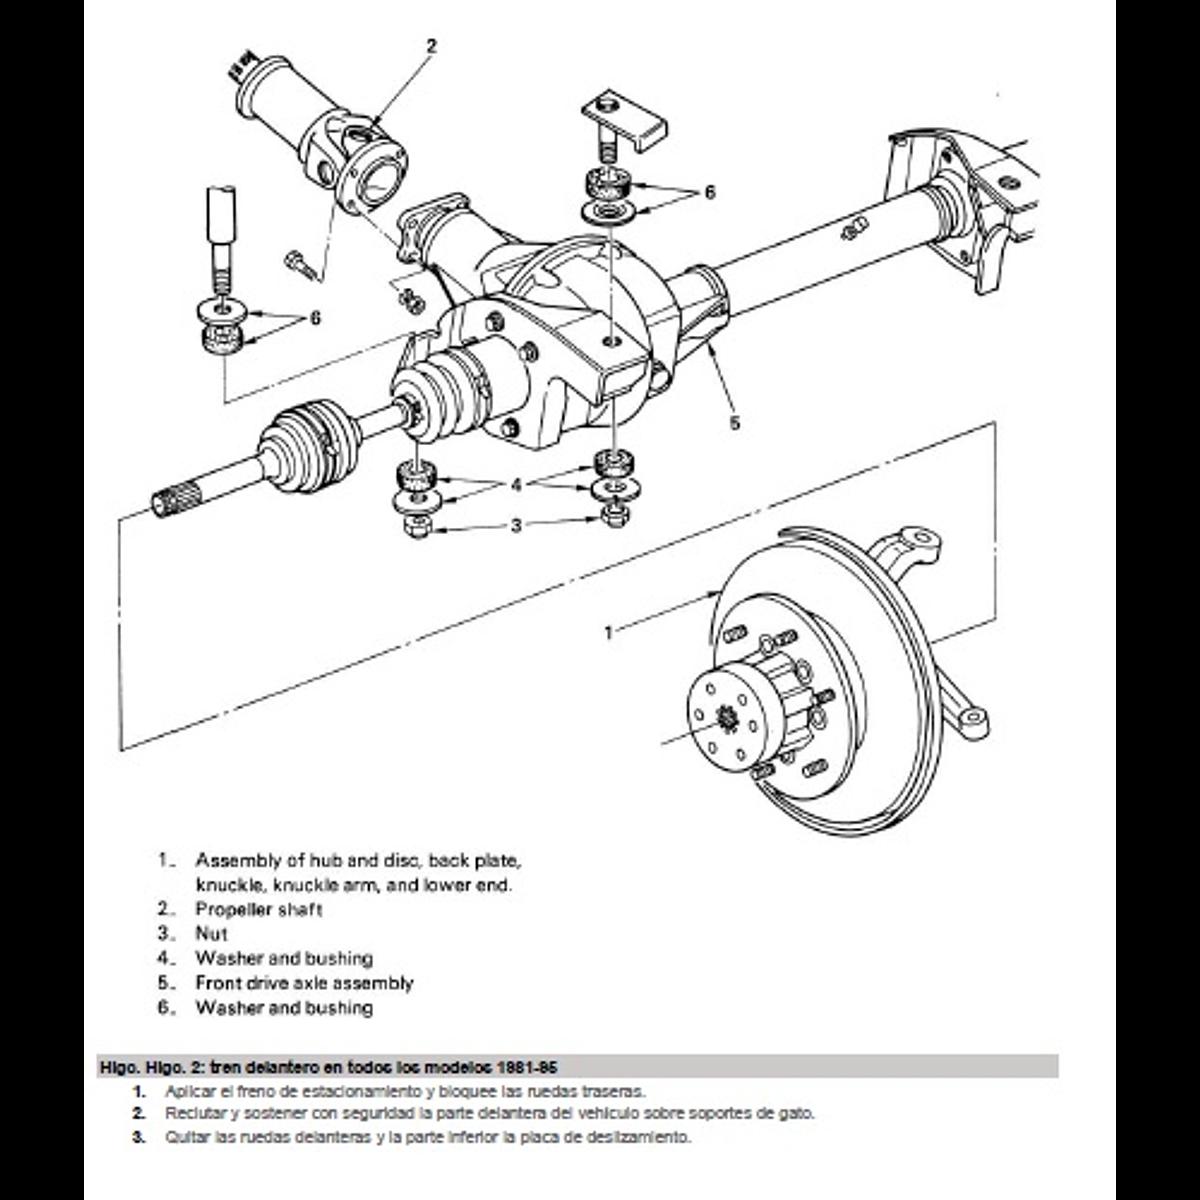 Manual De Taller Chevrolet Luv